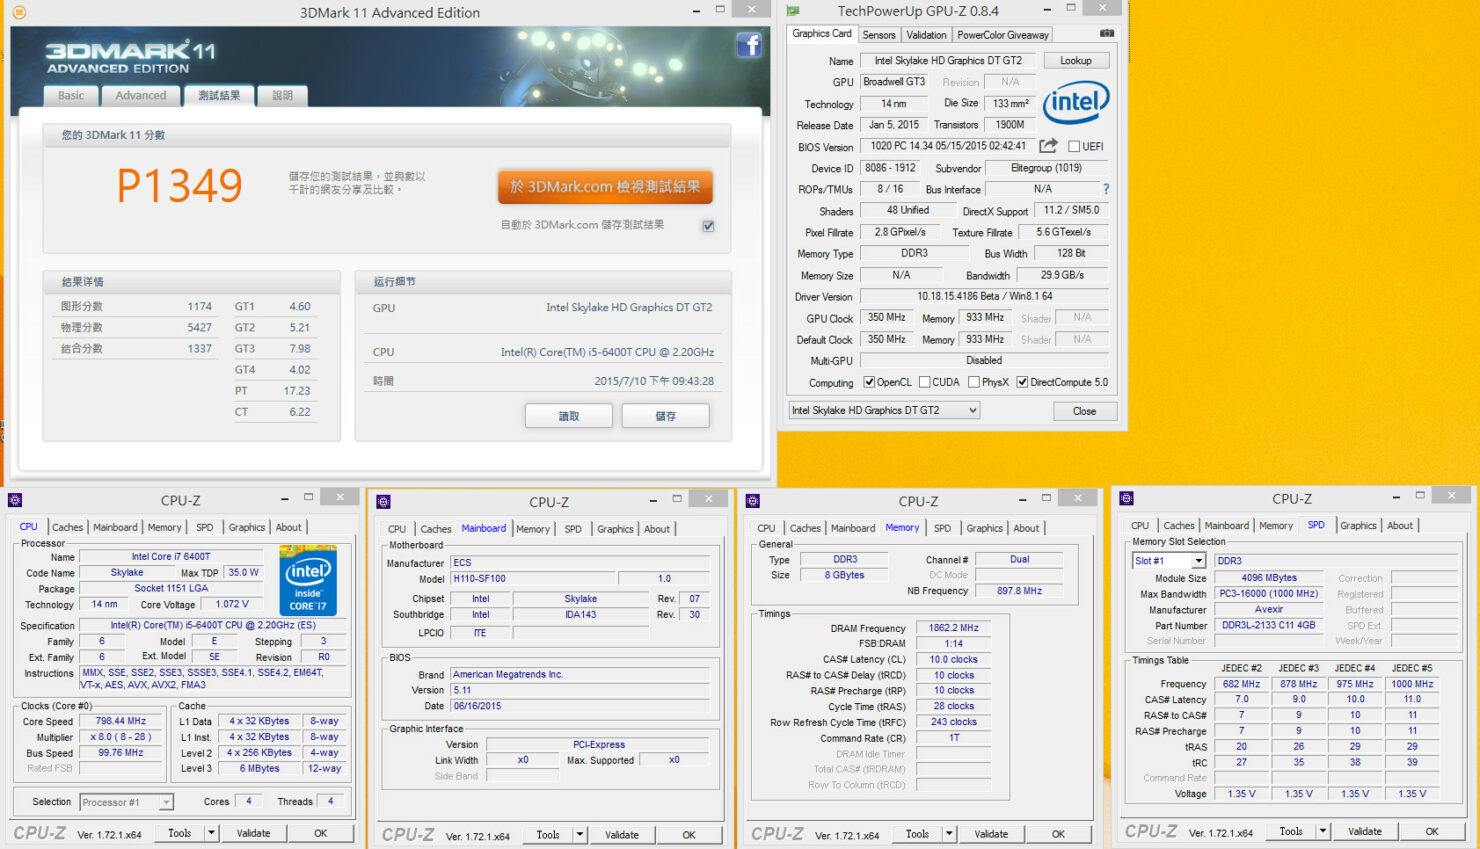 skylake-core-i5-6400t_ddr3_3dmark-11-performance